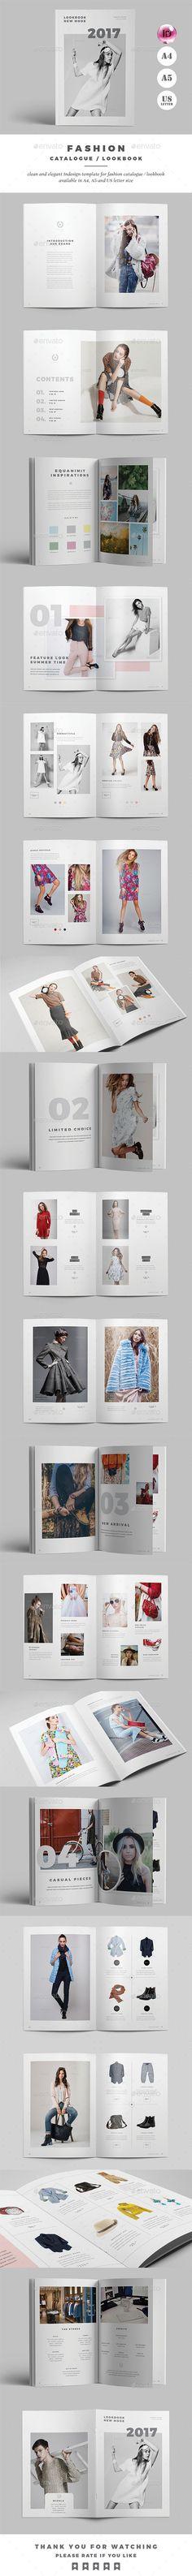 Fashion Catalogue / Lookbook - Catalogs #Brochures Download here:  https://graphicriver.net/item/fashion-catalogue-lookbook/19585474?ref=alena994